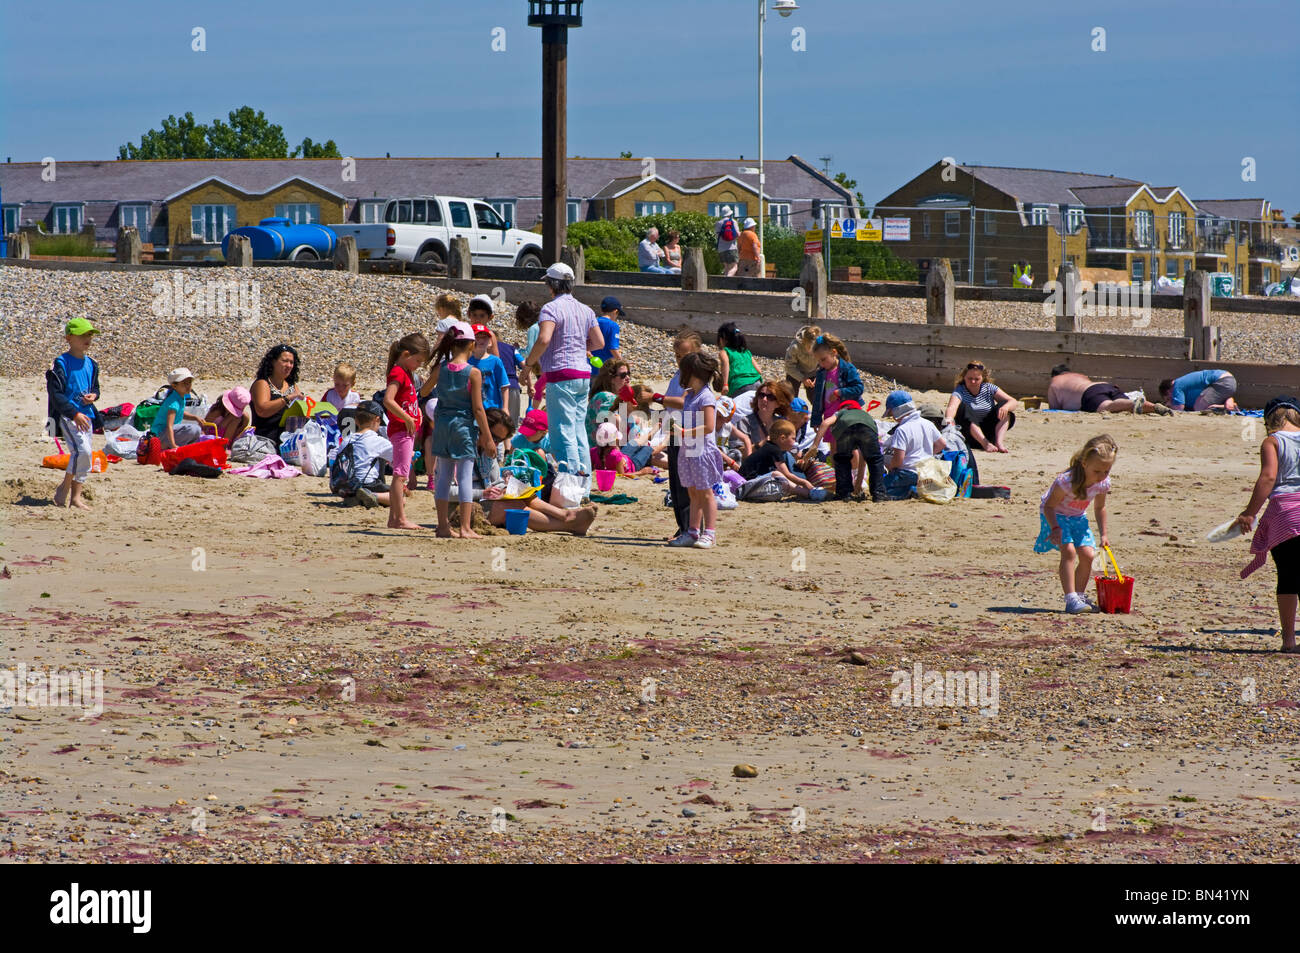 Group Of Young Schoolchildren On The Beach Littlehampton West Sussex England Stock Photo